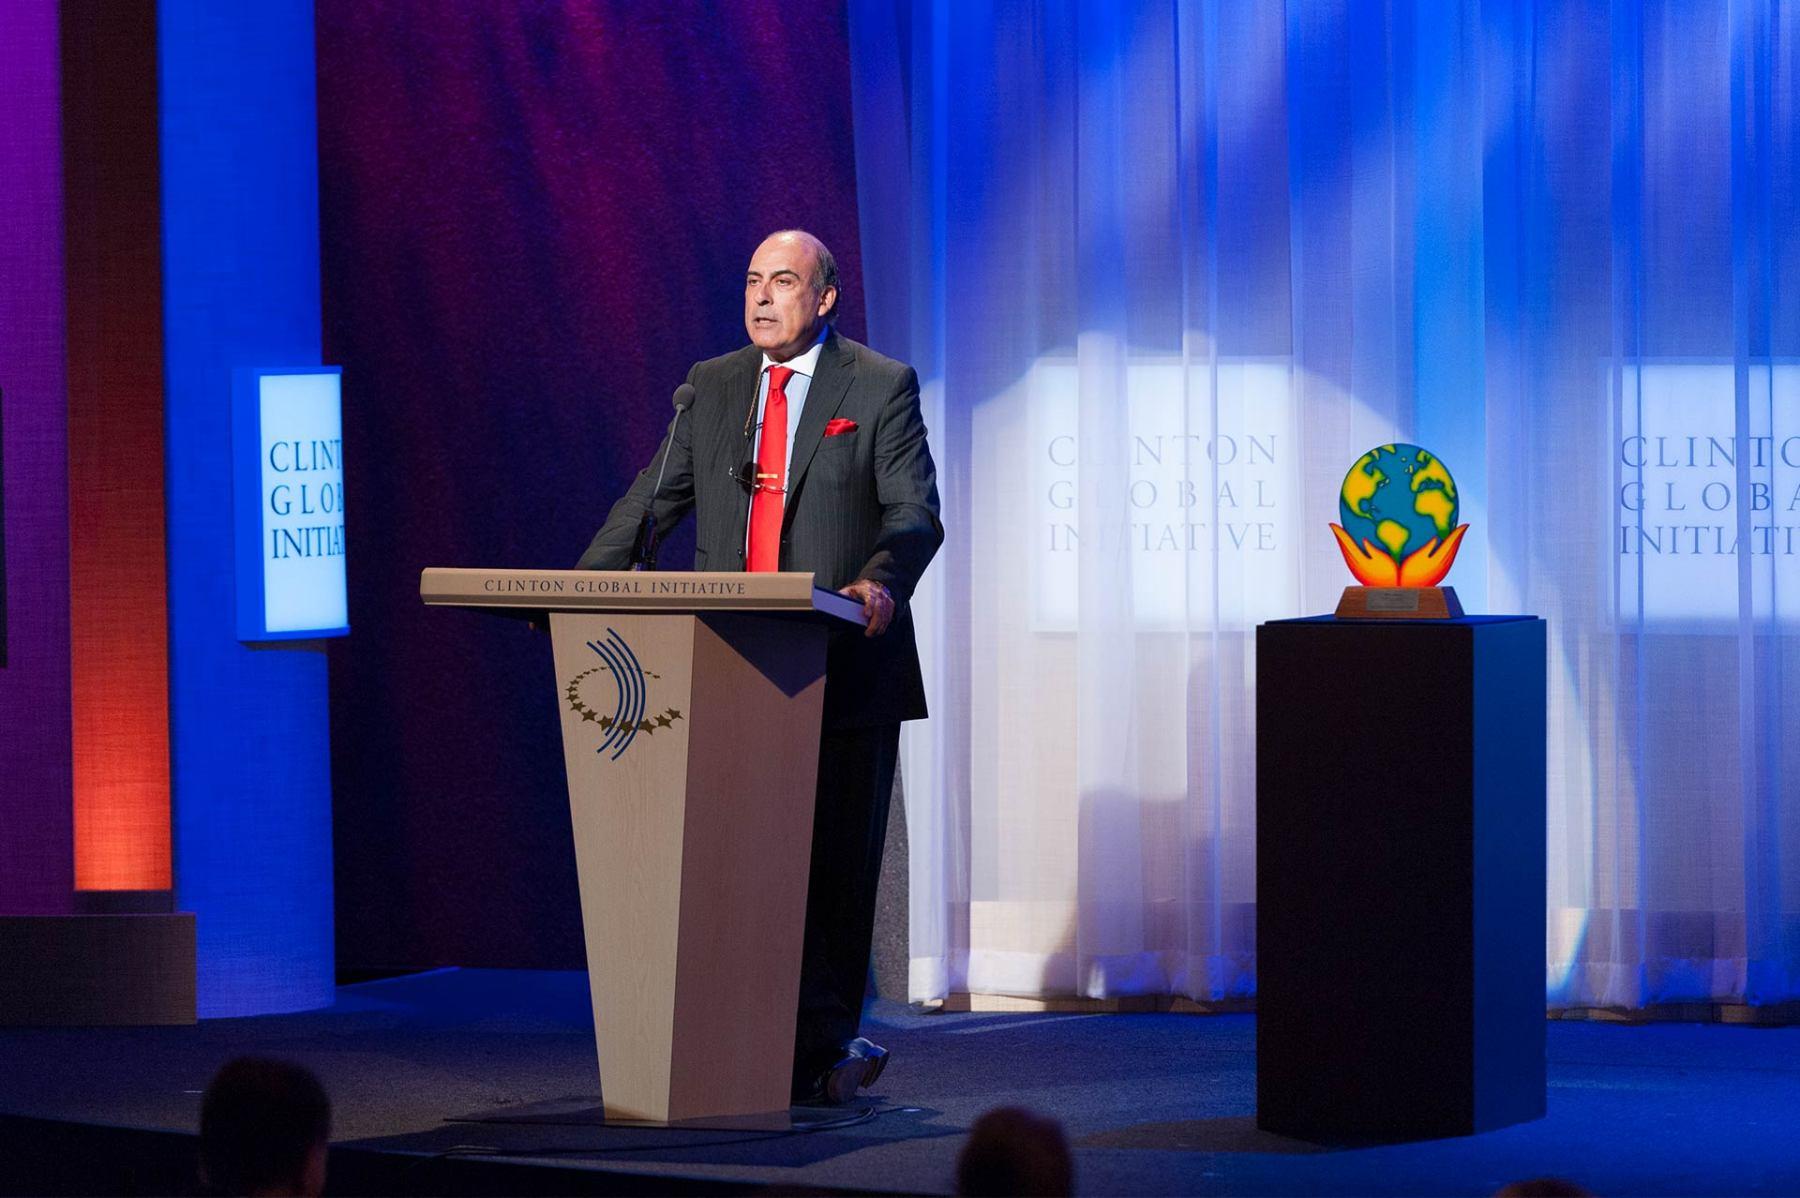 Clinton Global Citizen Awards, Clinton Global Initiative, CGI 2011, New York City, 09-22-2011